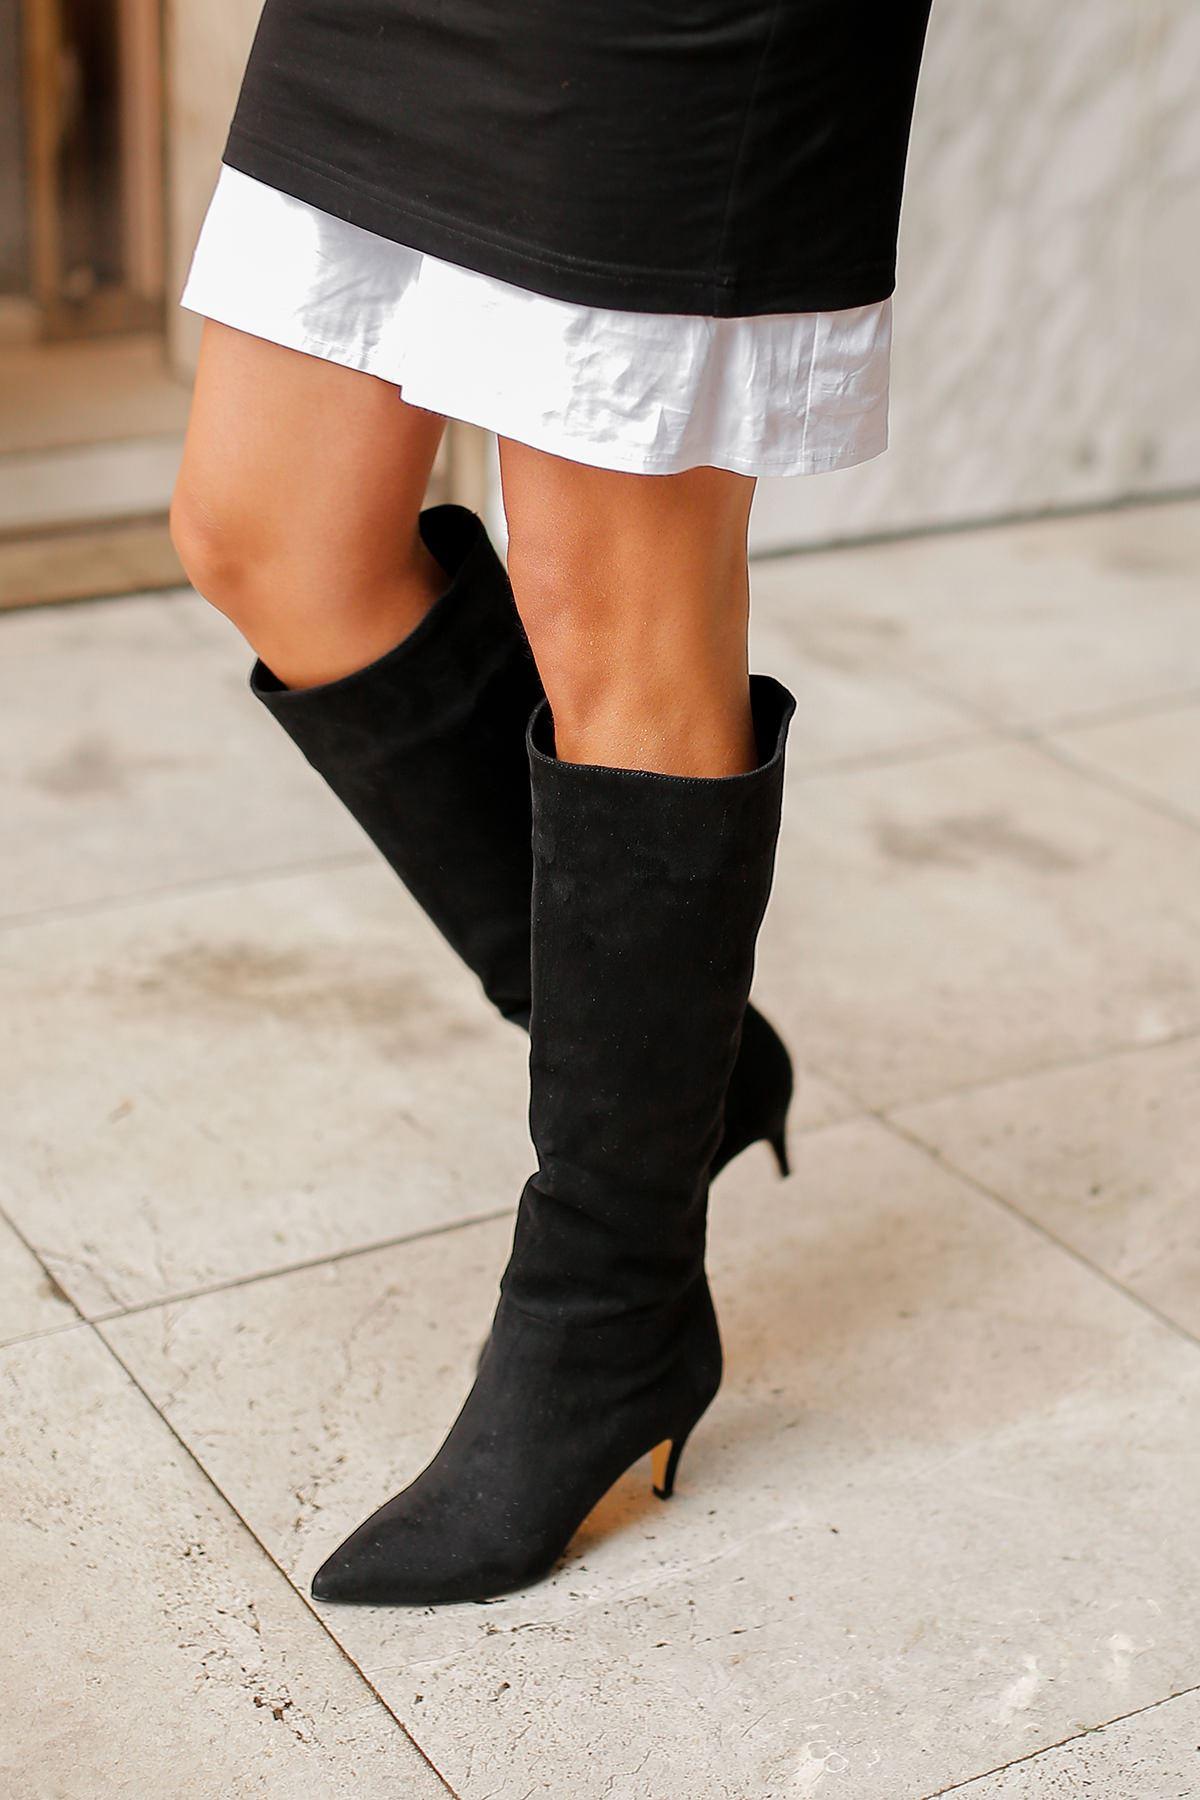 Vanetto Kadın Süet Topuklu Çizme-Siyah